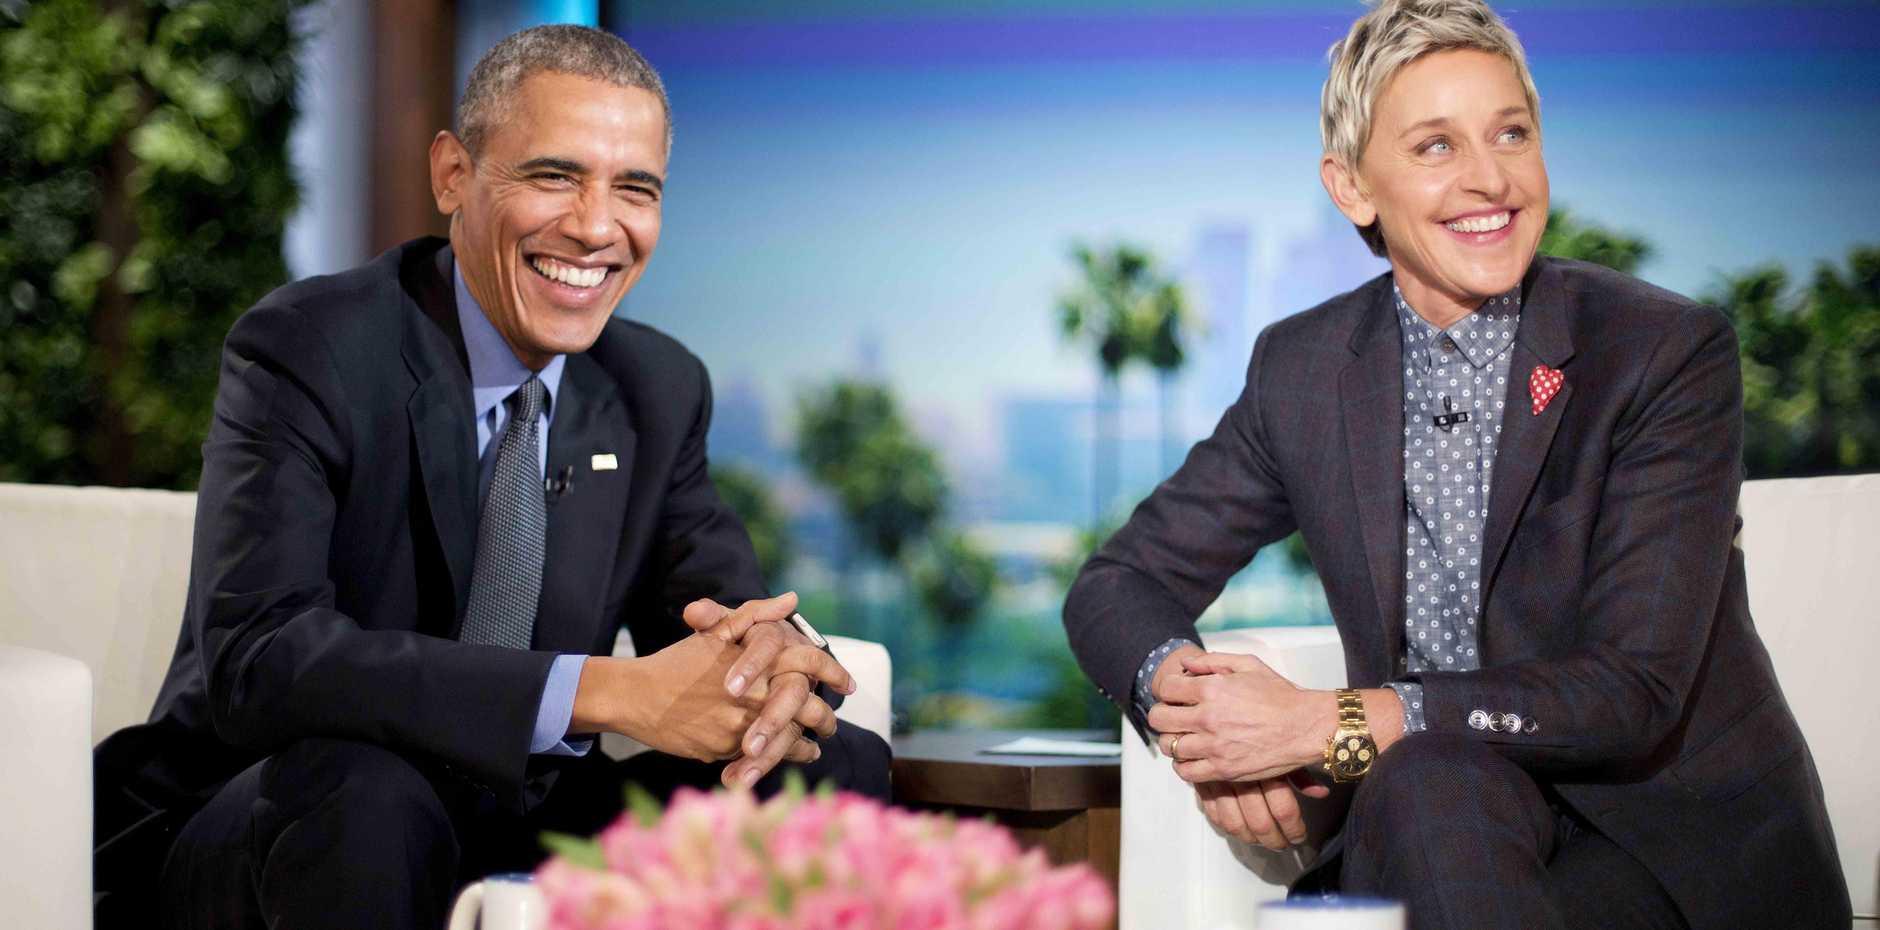 Ellen DeGeneres welcomes President Barack Obama to the show in 2016